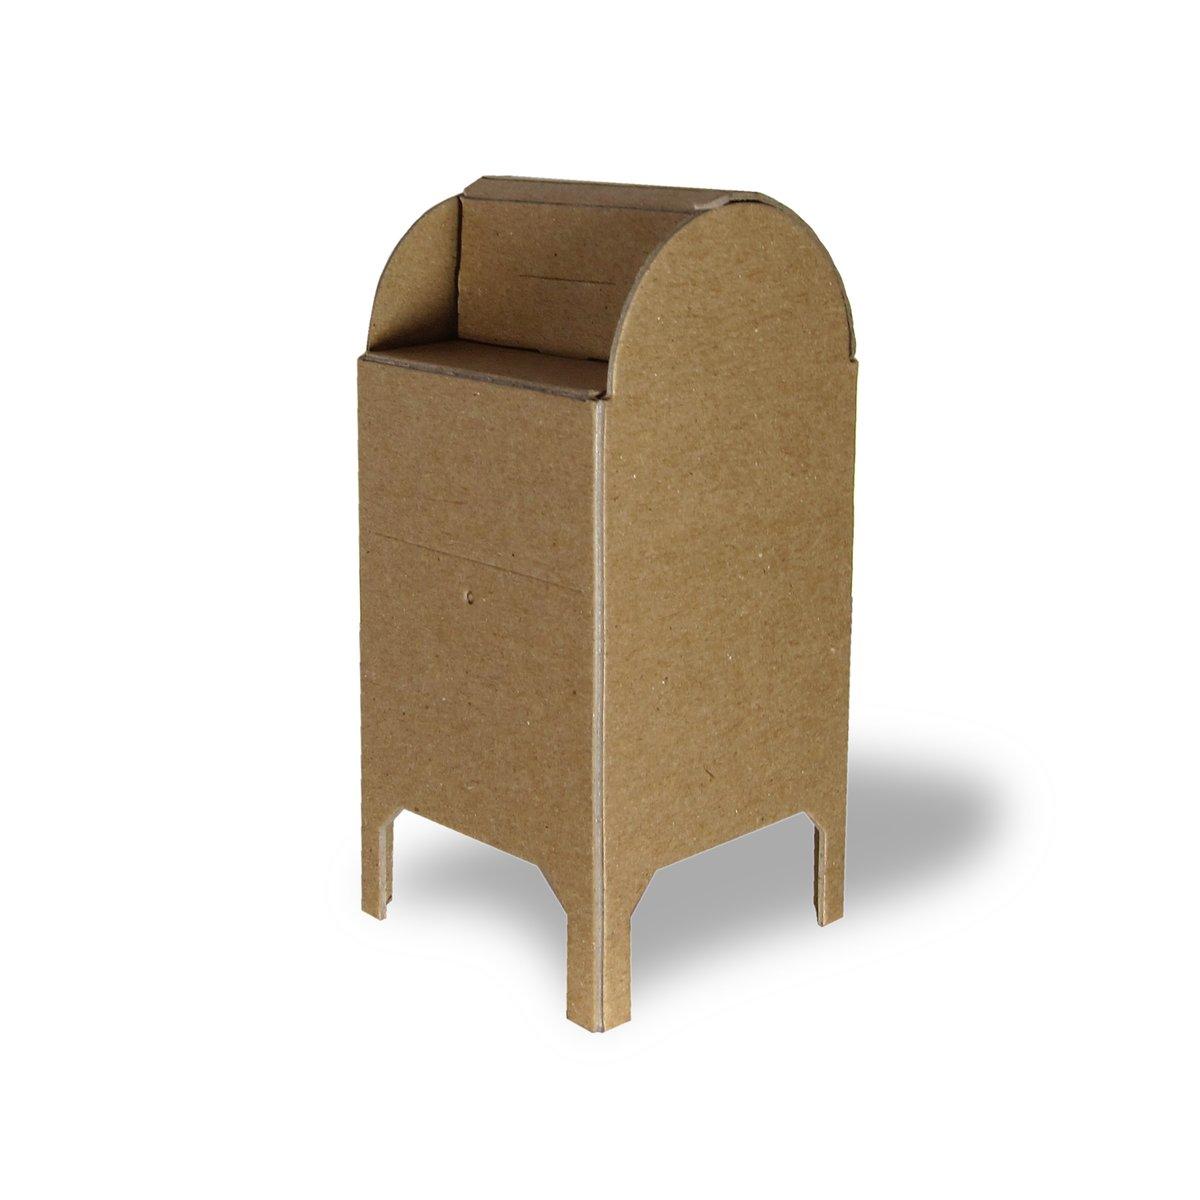 Image of Boundless Brooklyn - Model Mailbox Kit